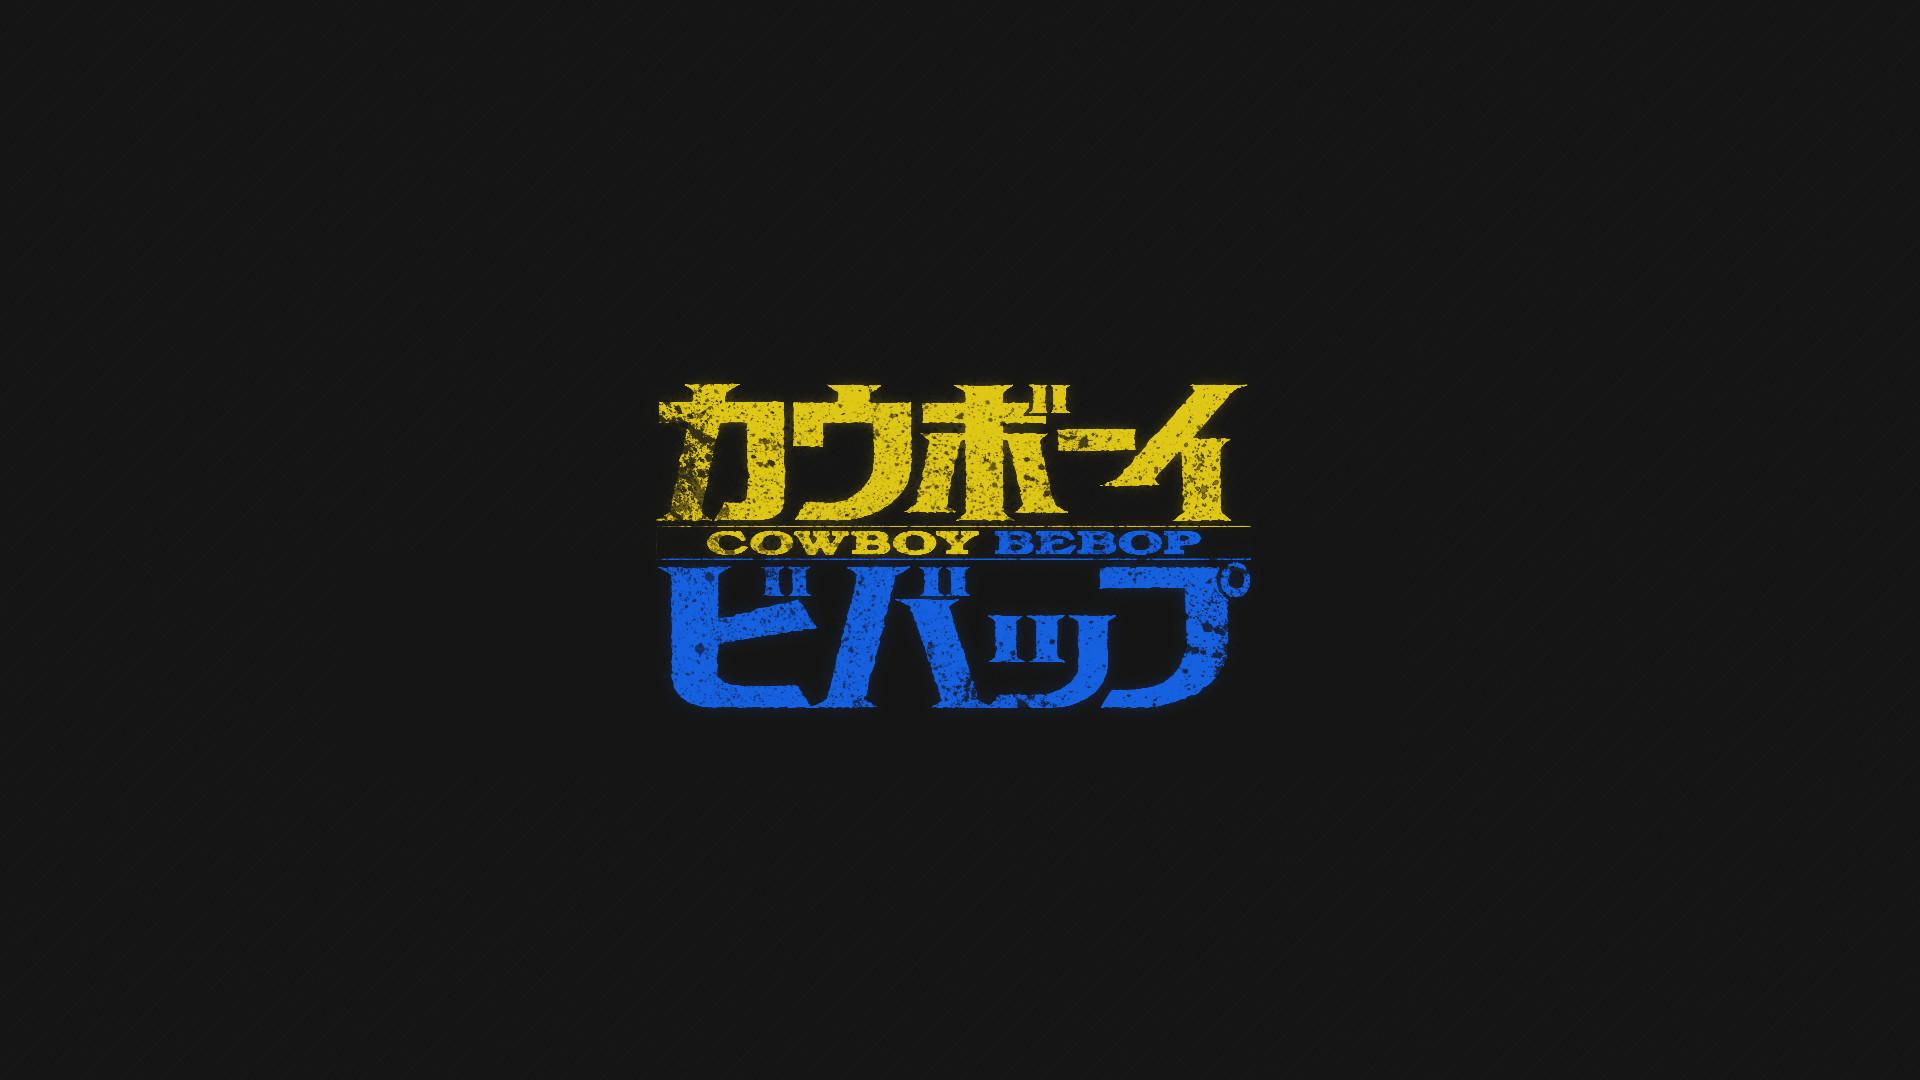 … Cowboy Bebop Wallpaper by zsoca-san